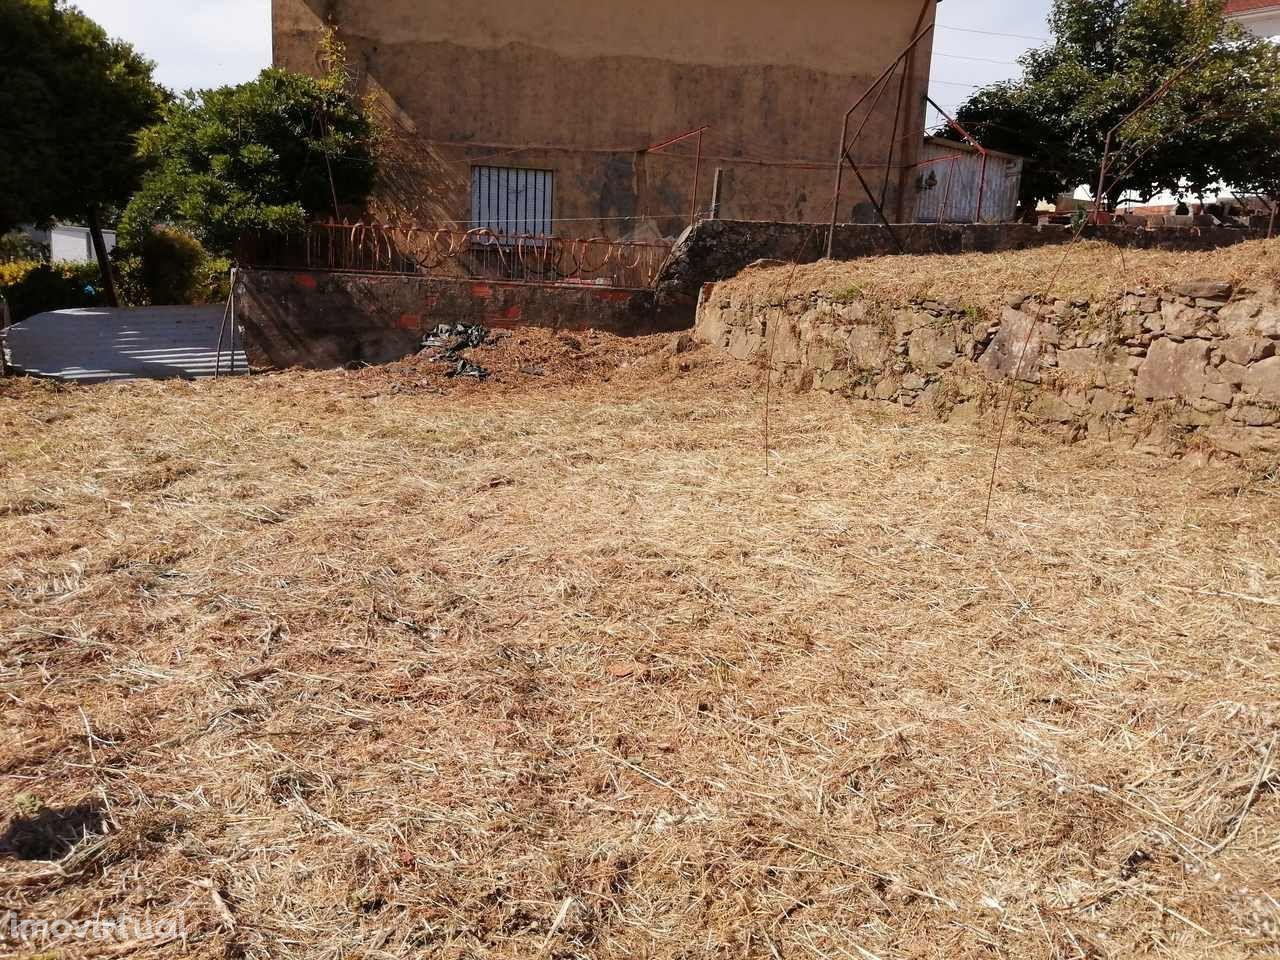 Terreno para comprar, Arrifana, Santa Maria da Feira, Aveiro - Foto 4